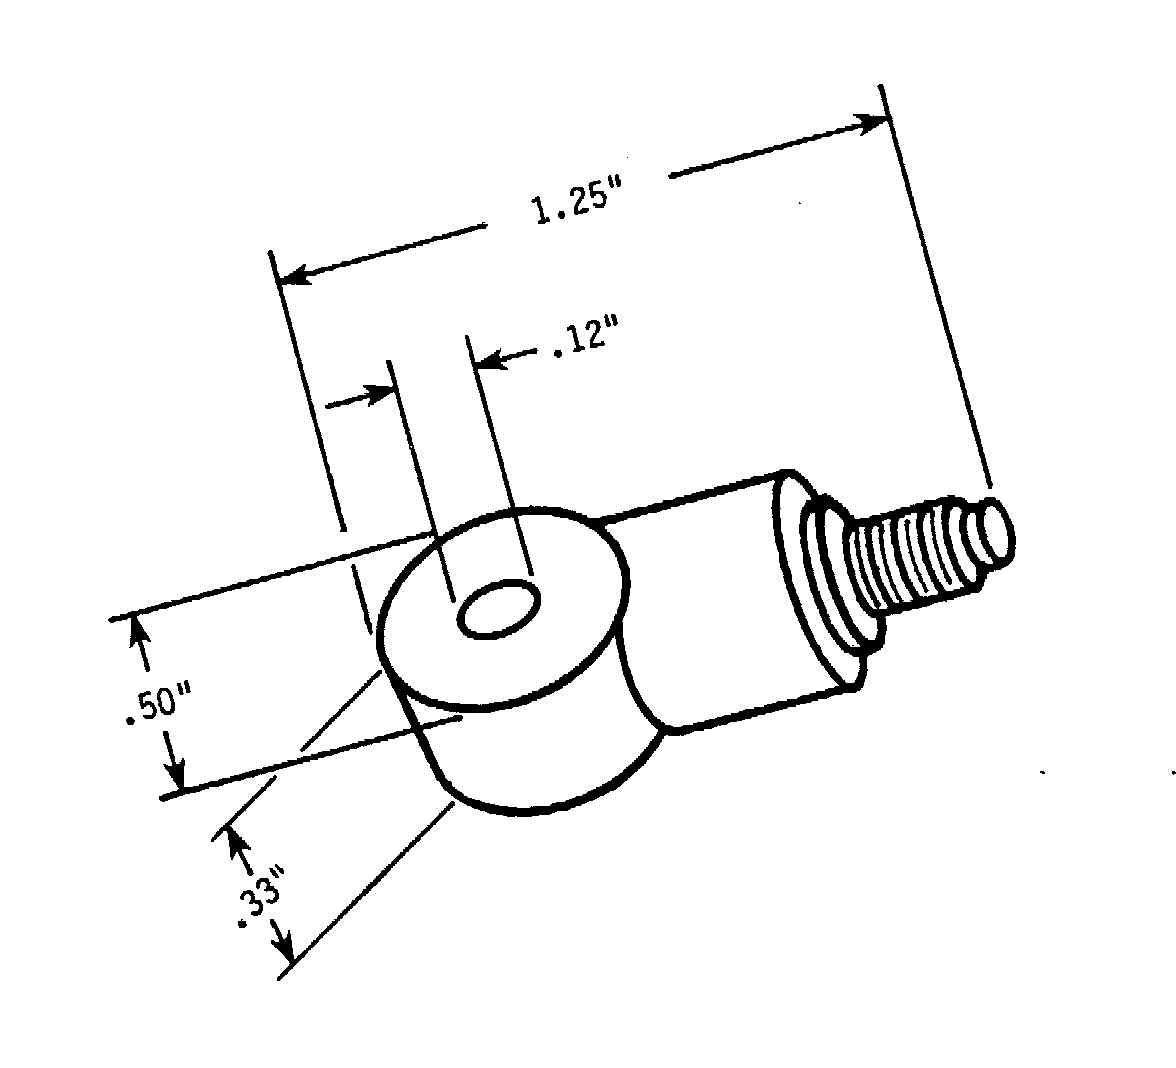 Prodyn Current Transducer Ip Series 0 12 Aperture